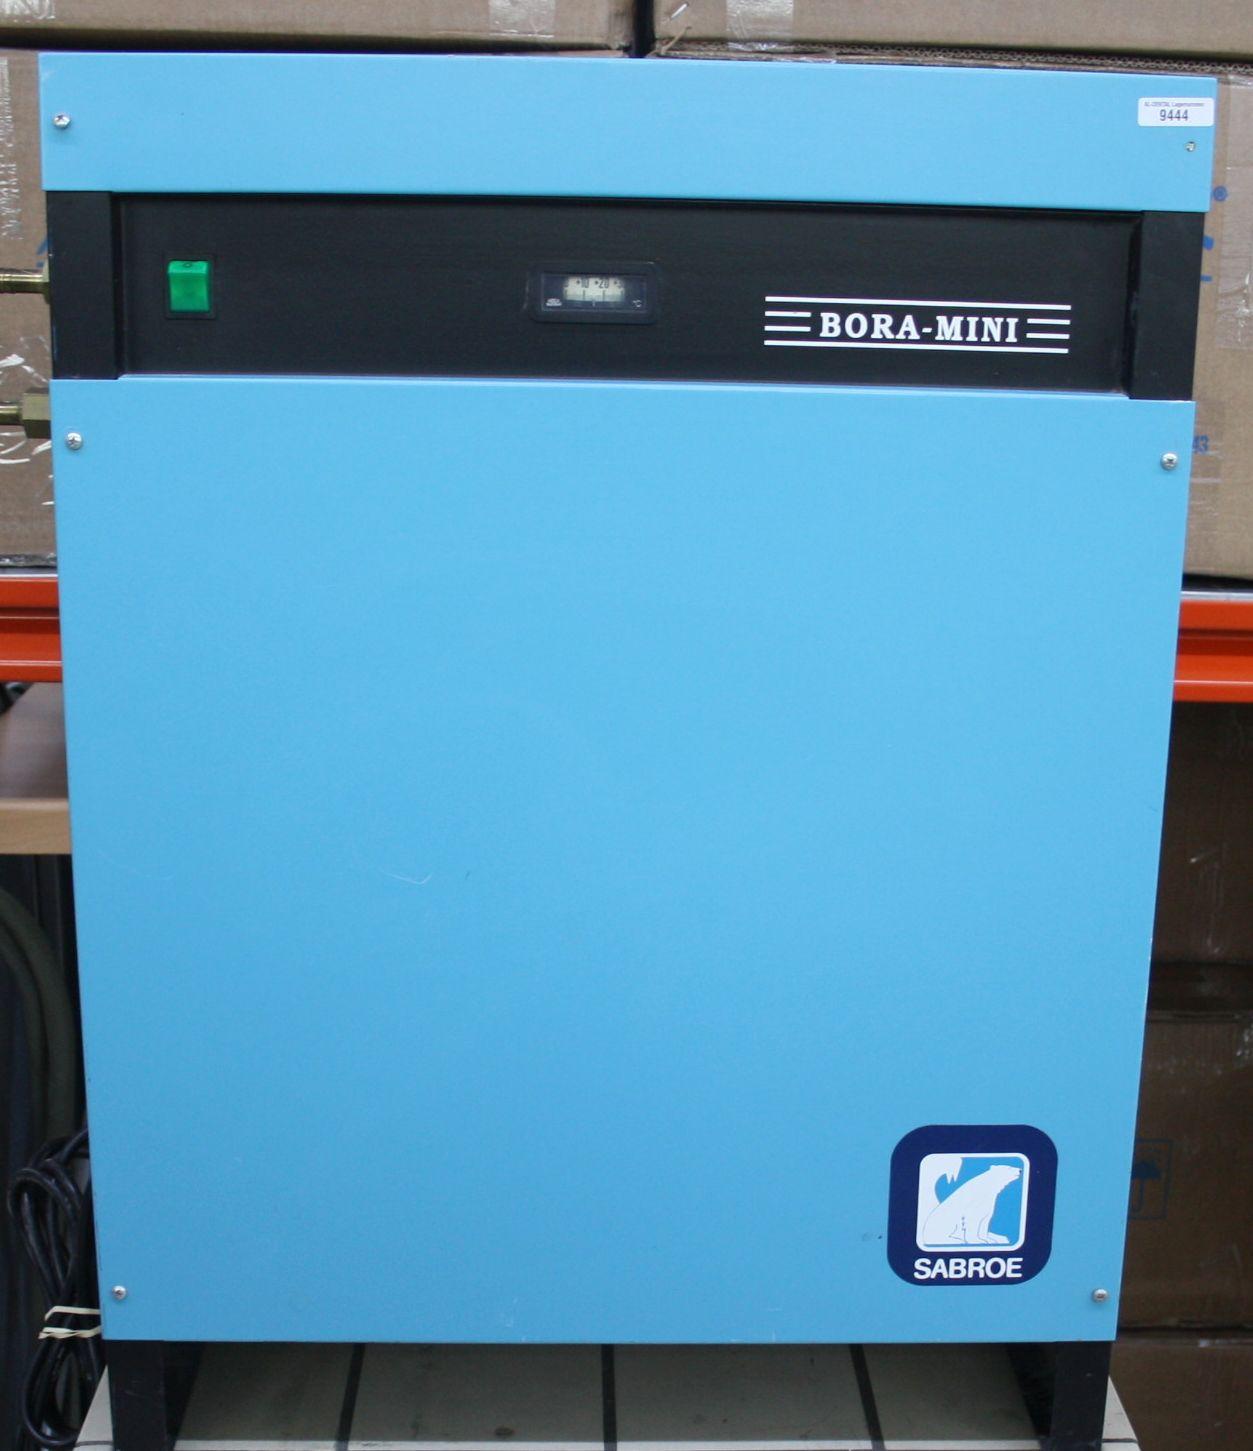 SABROE Kältetrockner / Kälteanlage Typ Bora-Mini  SV 19 A # 9444